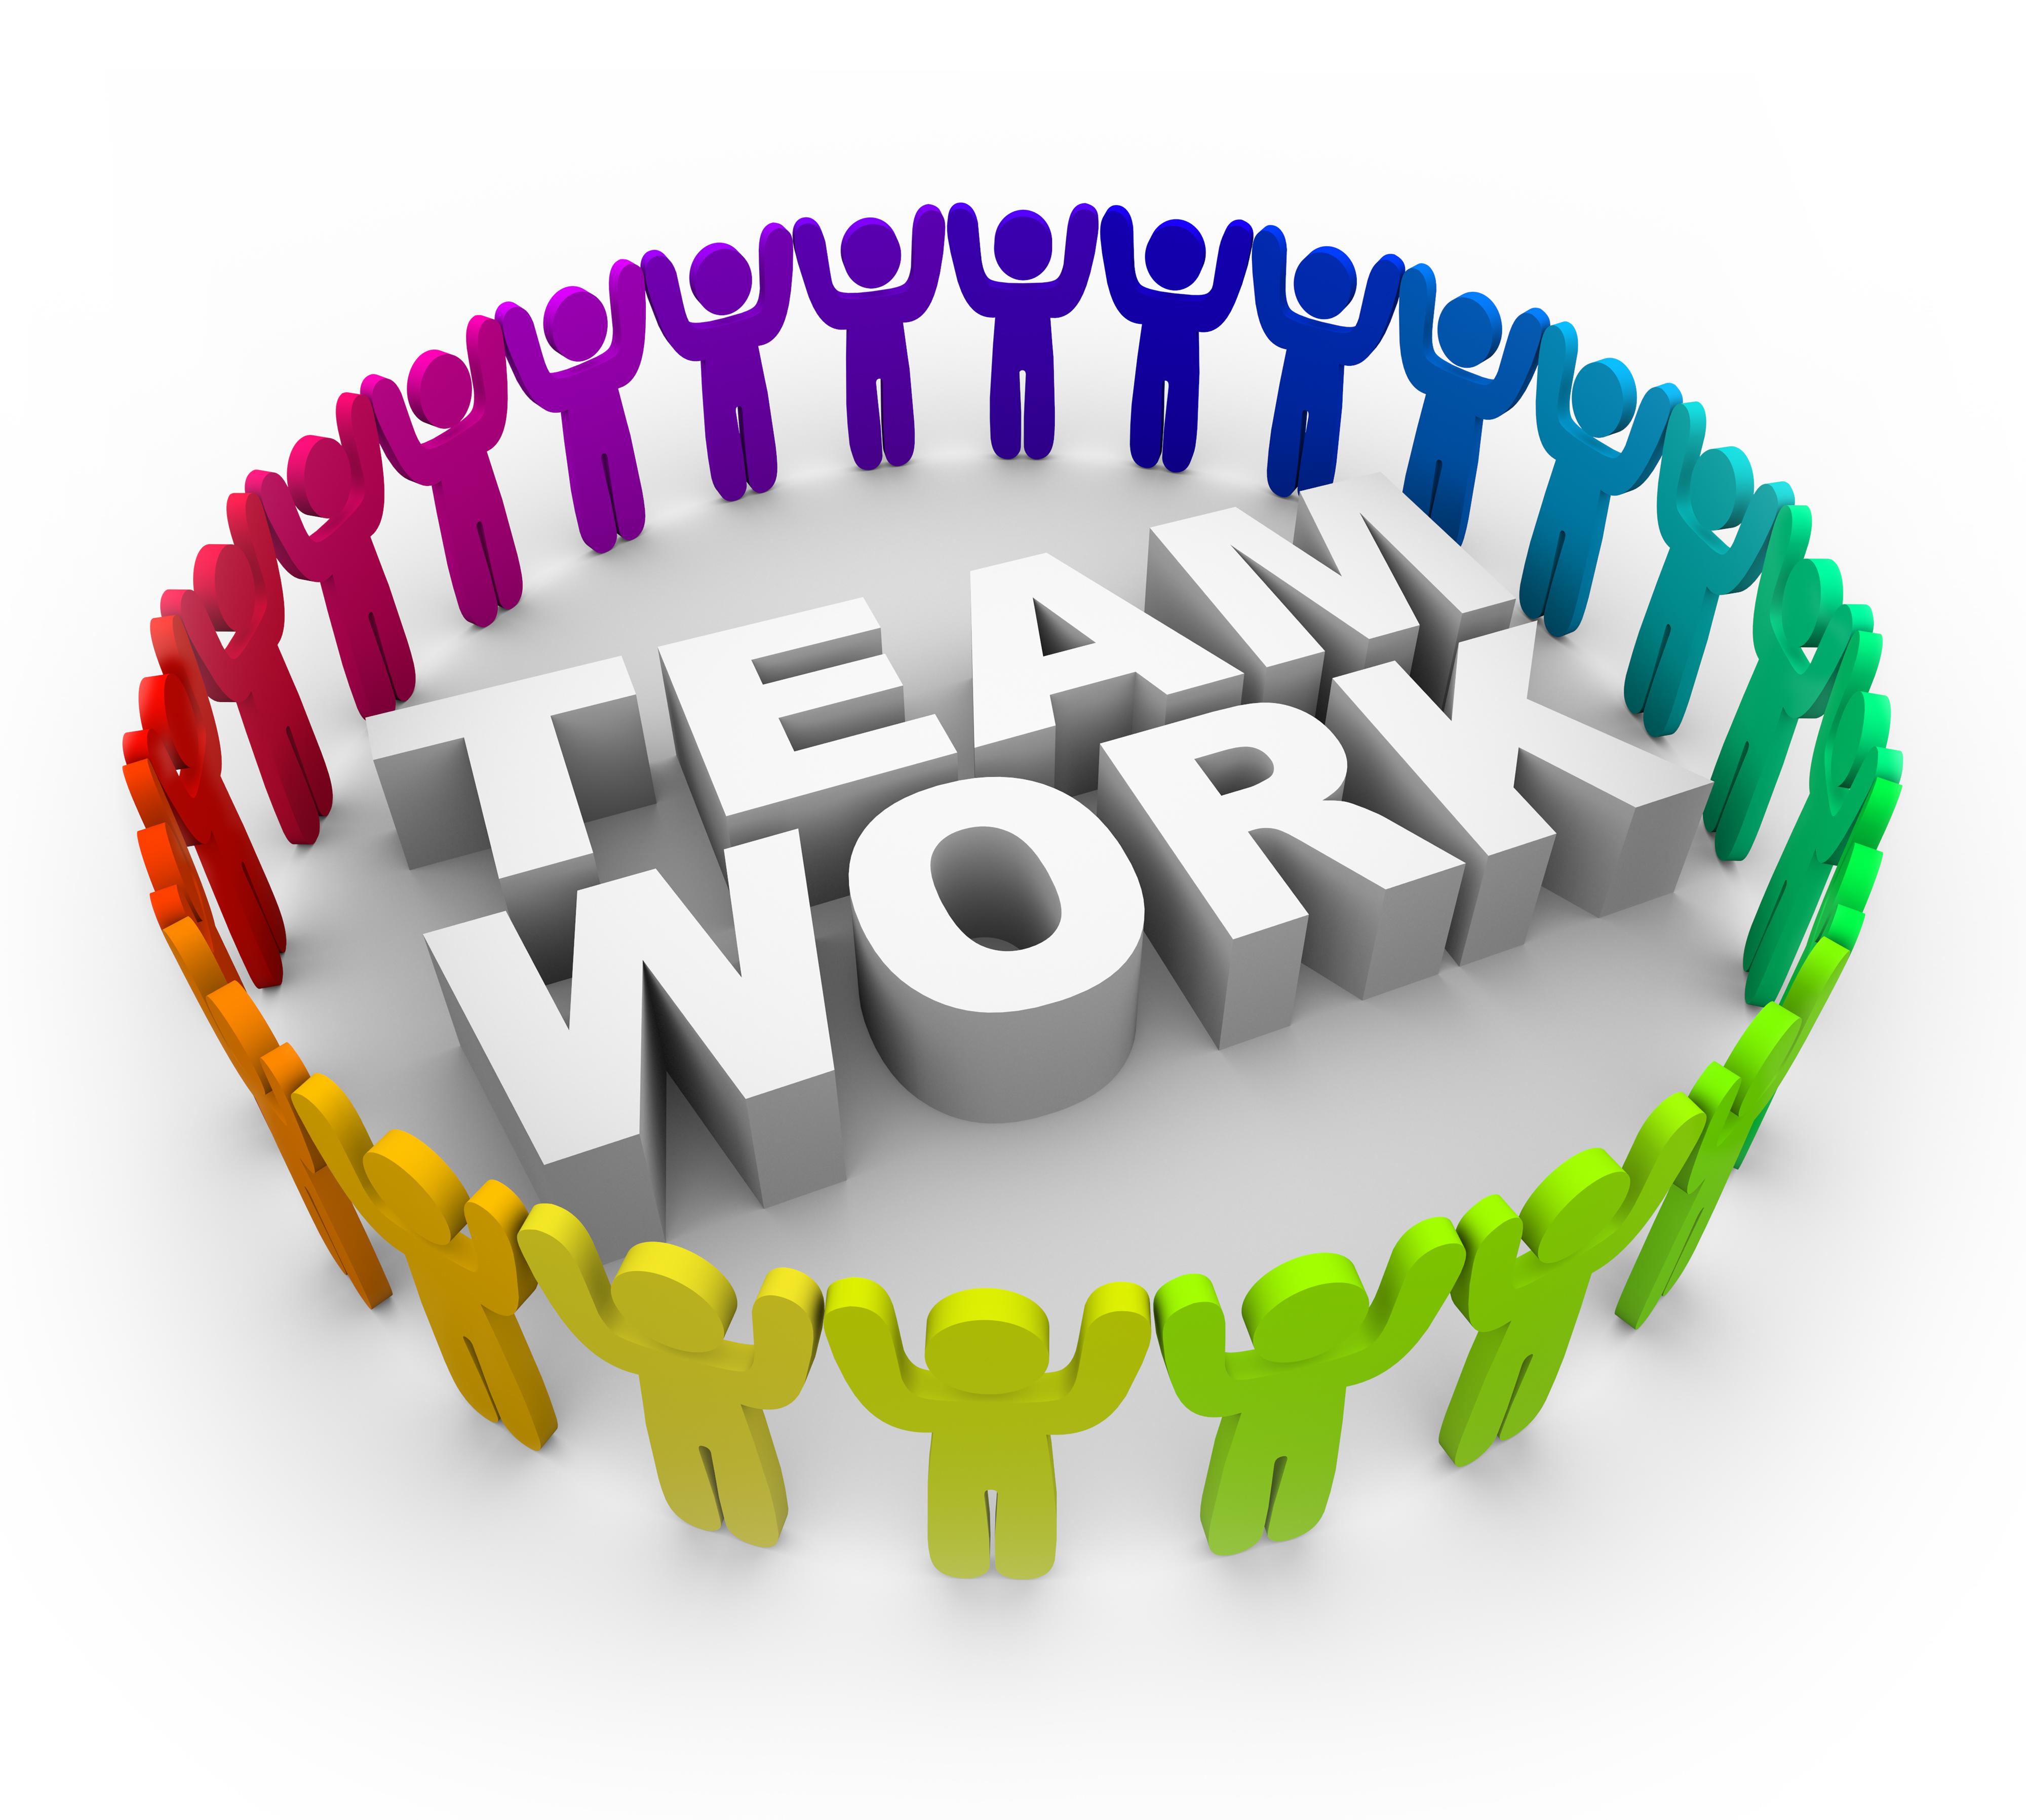 Figurine clipart teamwork Download Clip quotesgram Free Art